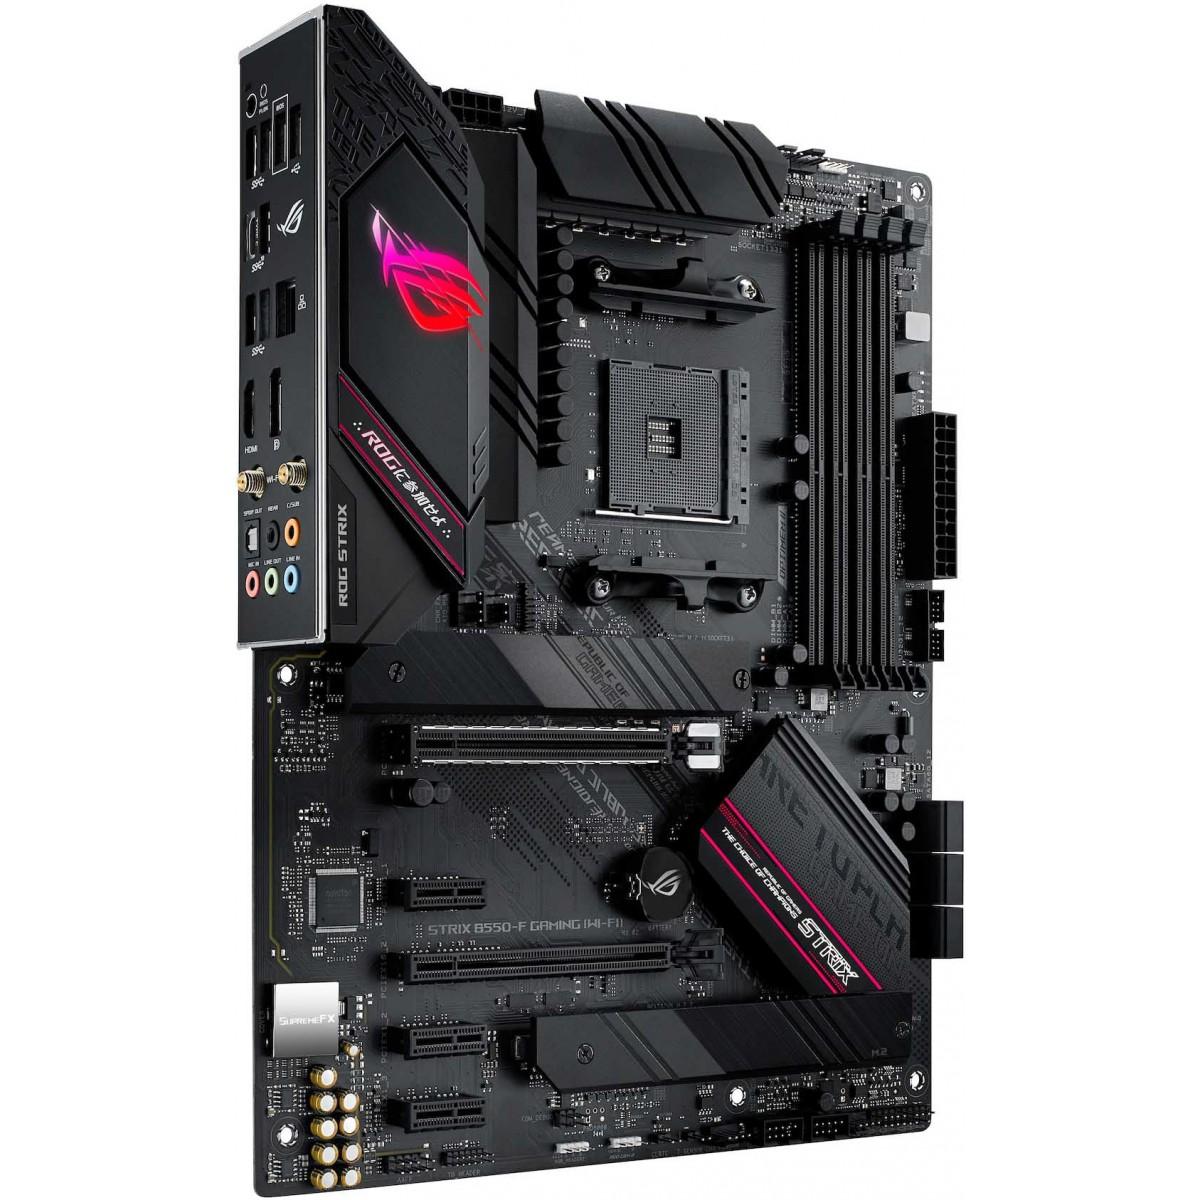 Placa Mãe Asus Rog Strix B550-F Gaming WI-FI, Chipset B550, AMD AM4, ATX, DDR4